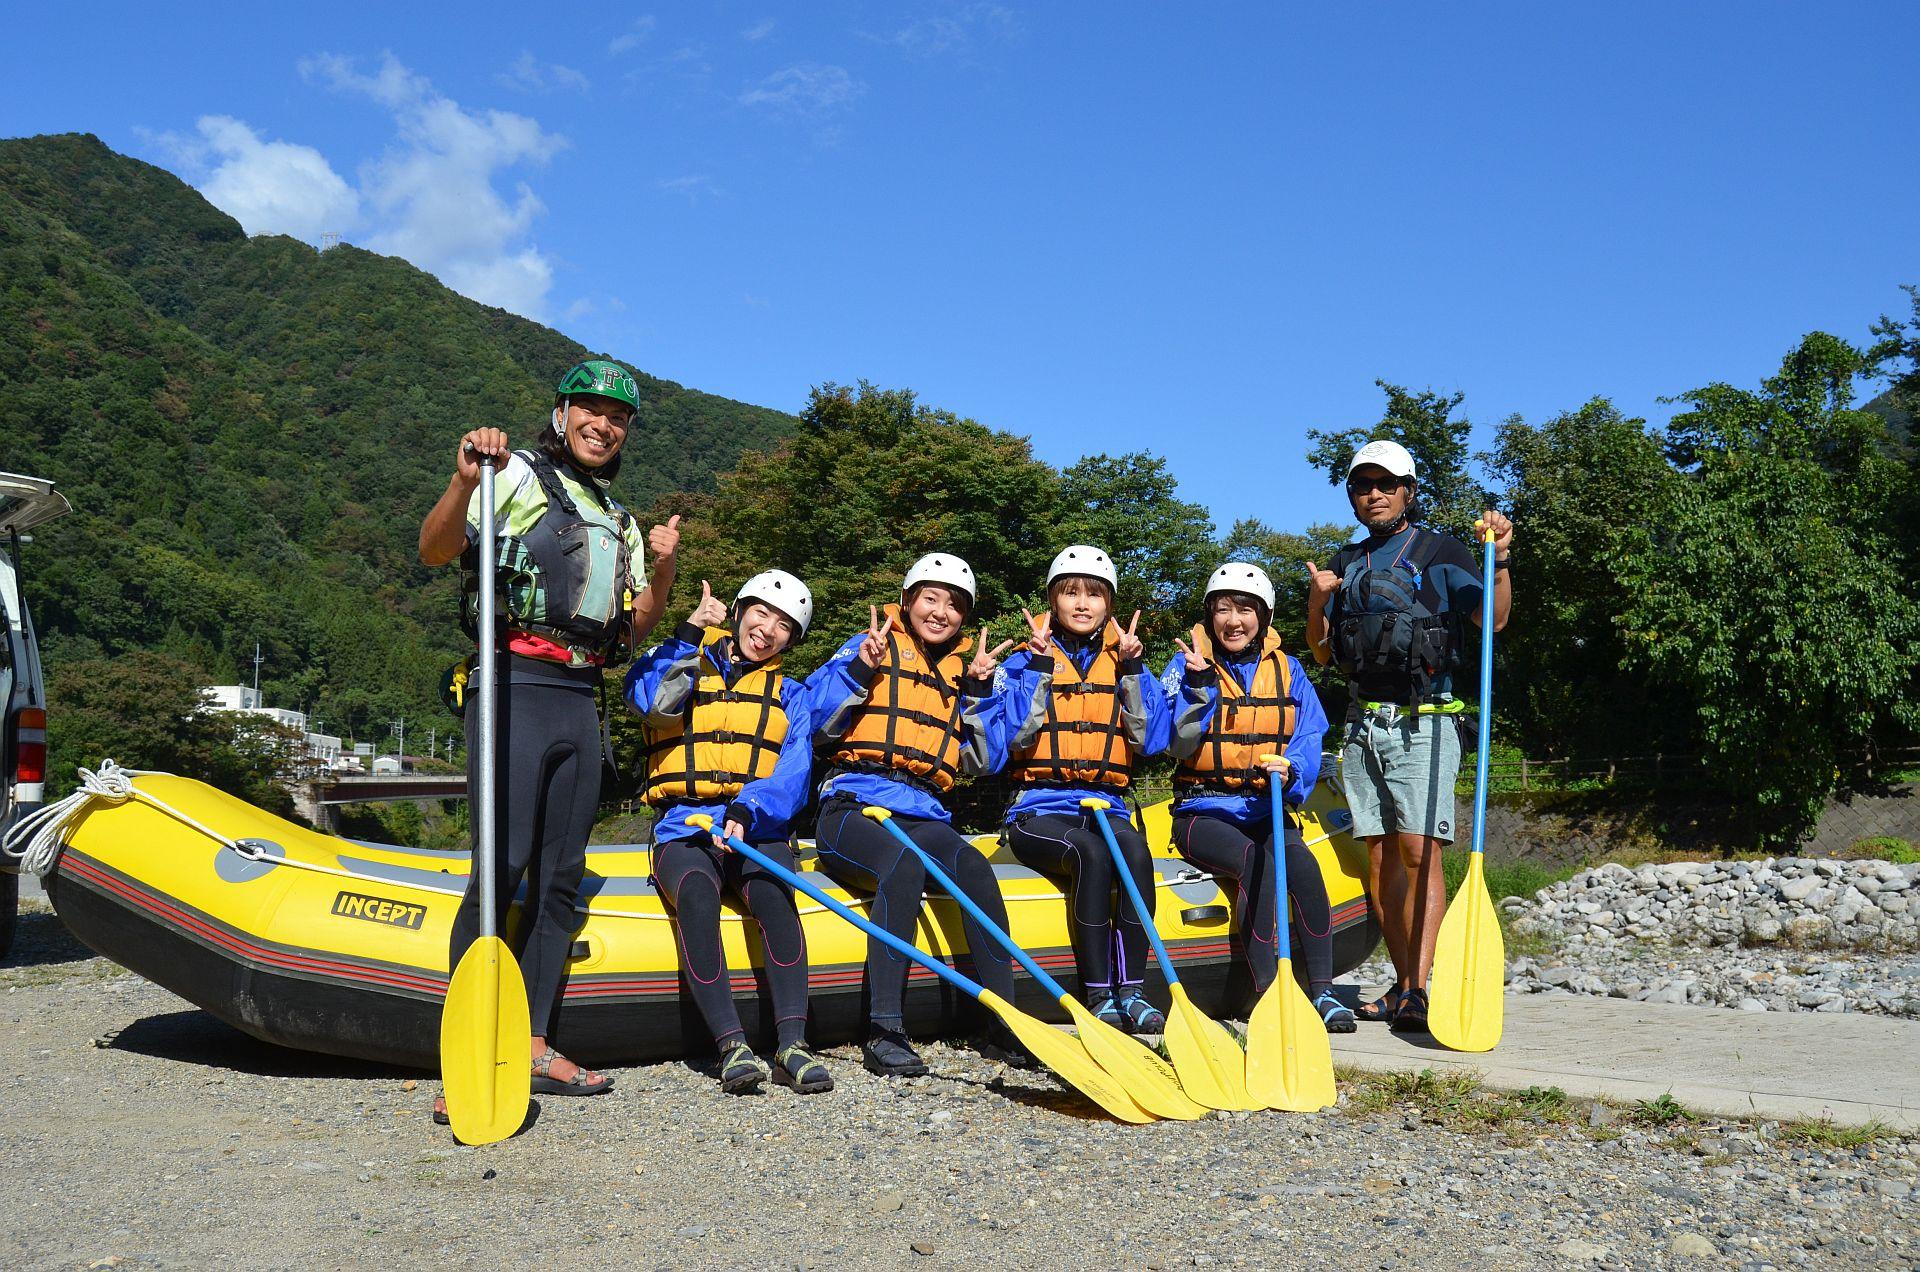 rafting20141007pm-1.jpg